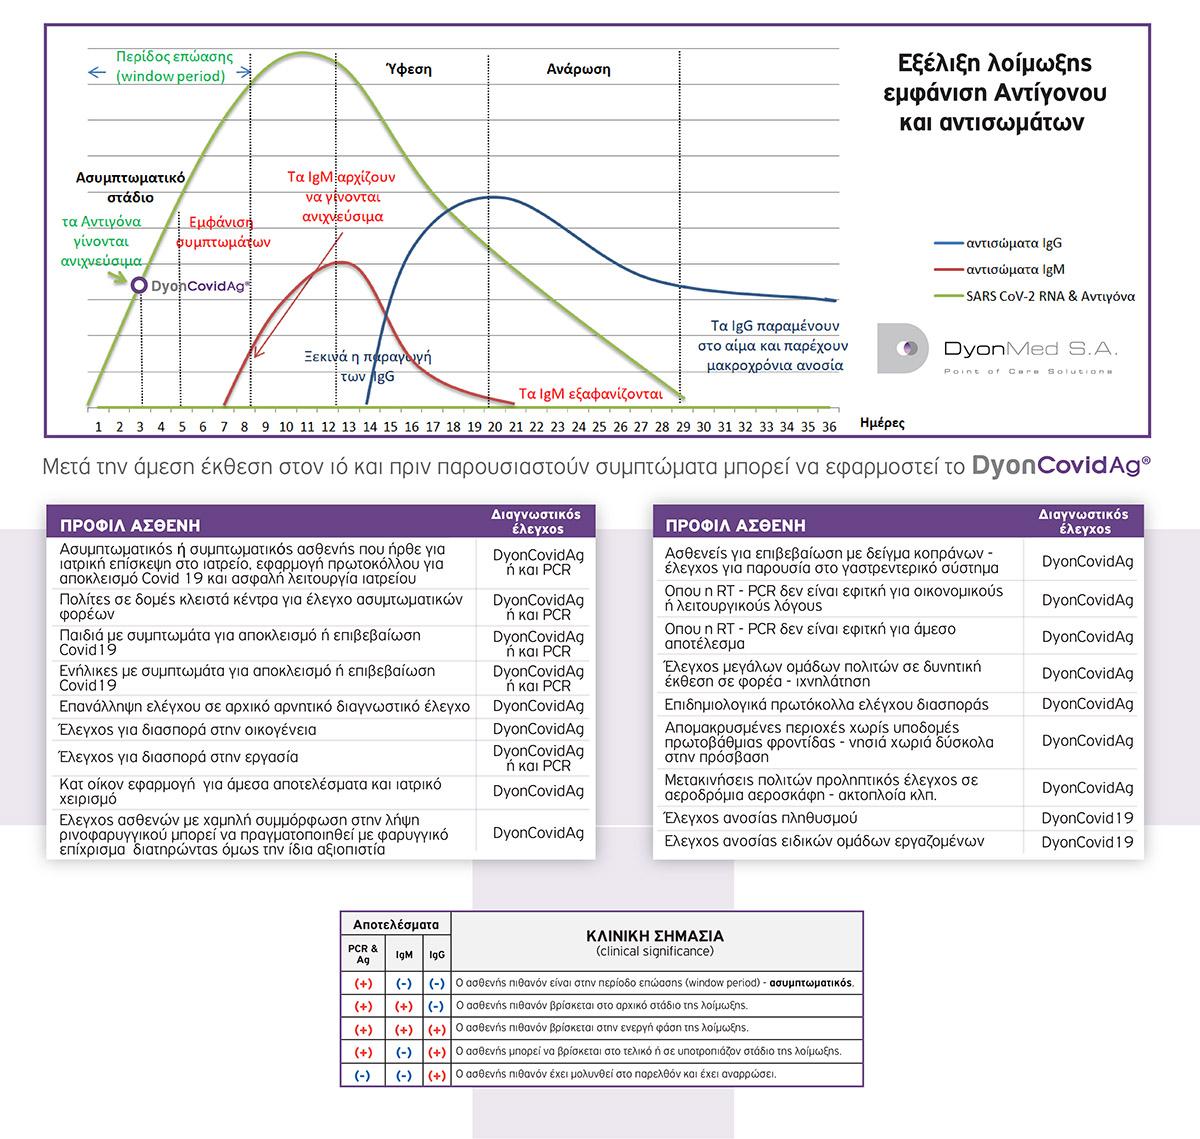 INSERT DyonCOVID-Ag